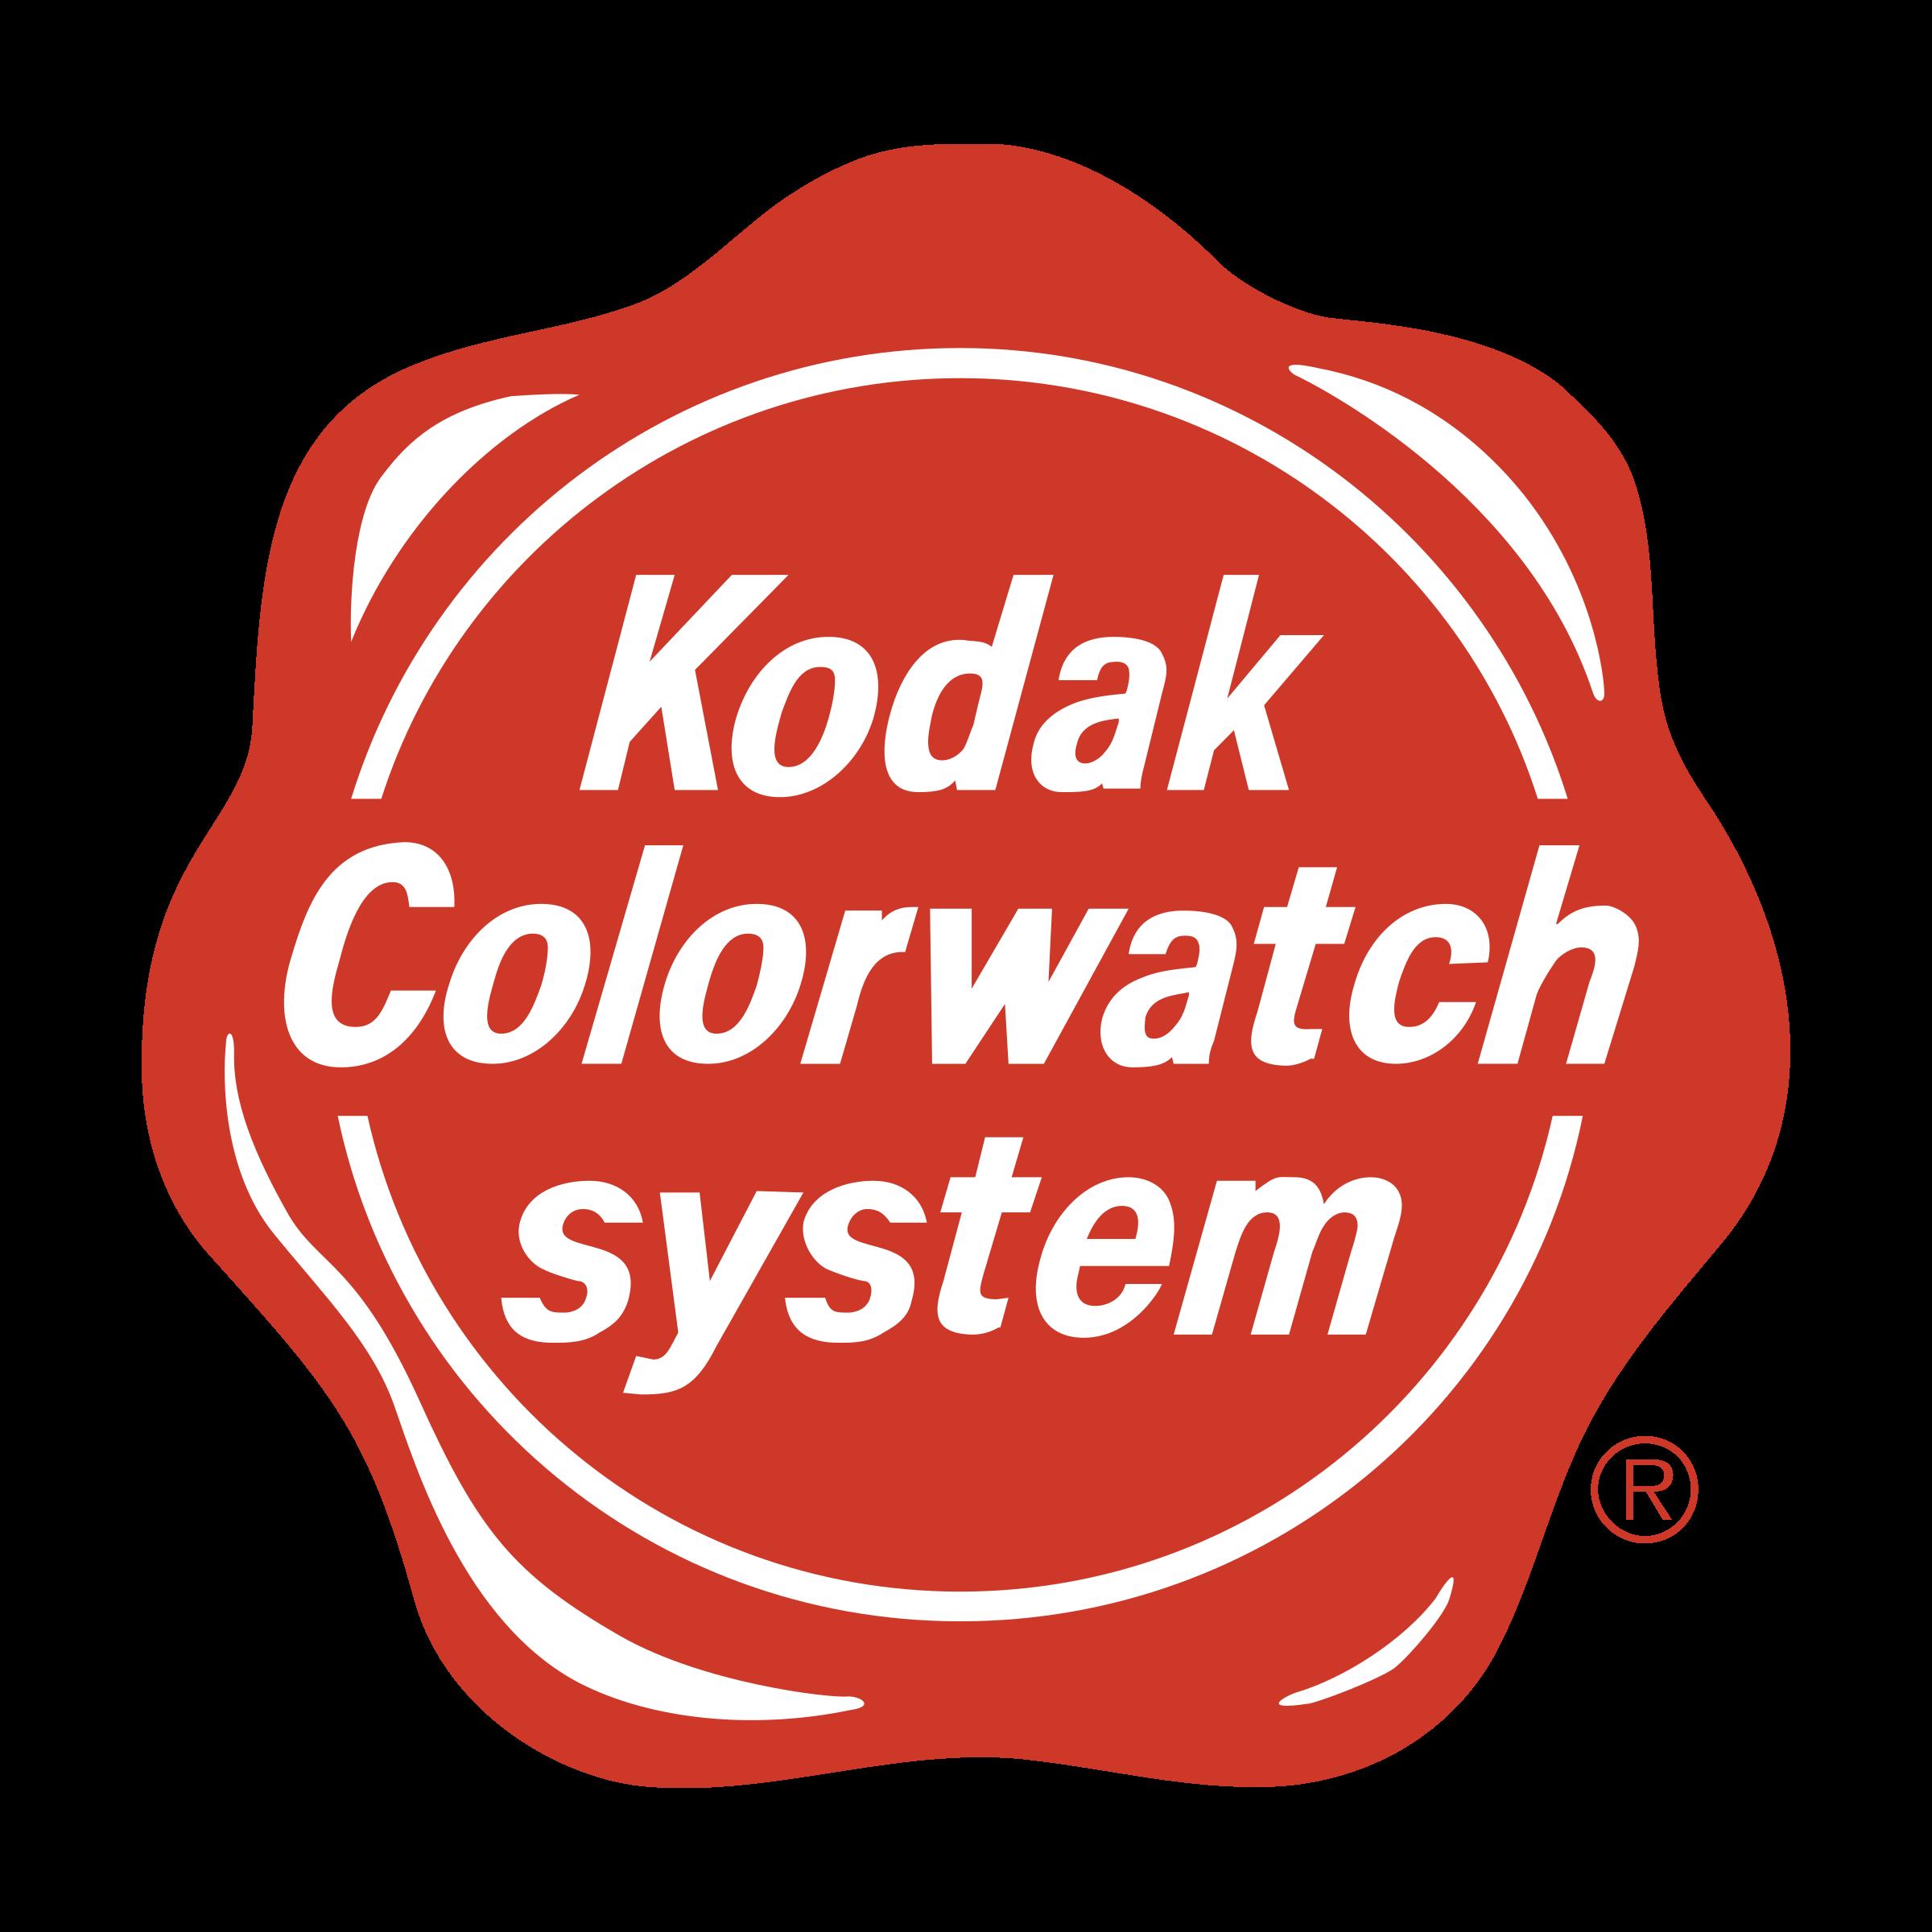 Kodak Colorwatch System Logo Png Transparent Svg Vector Freebie